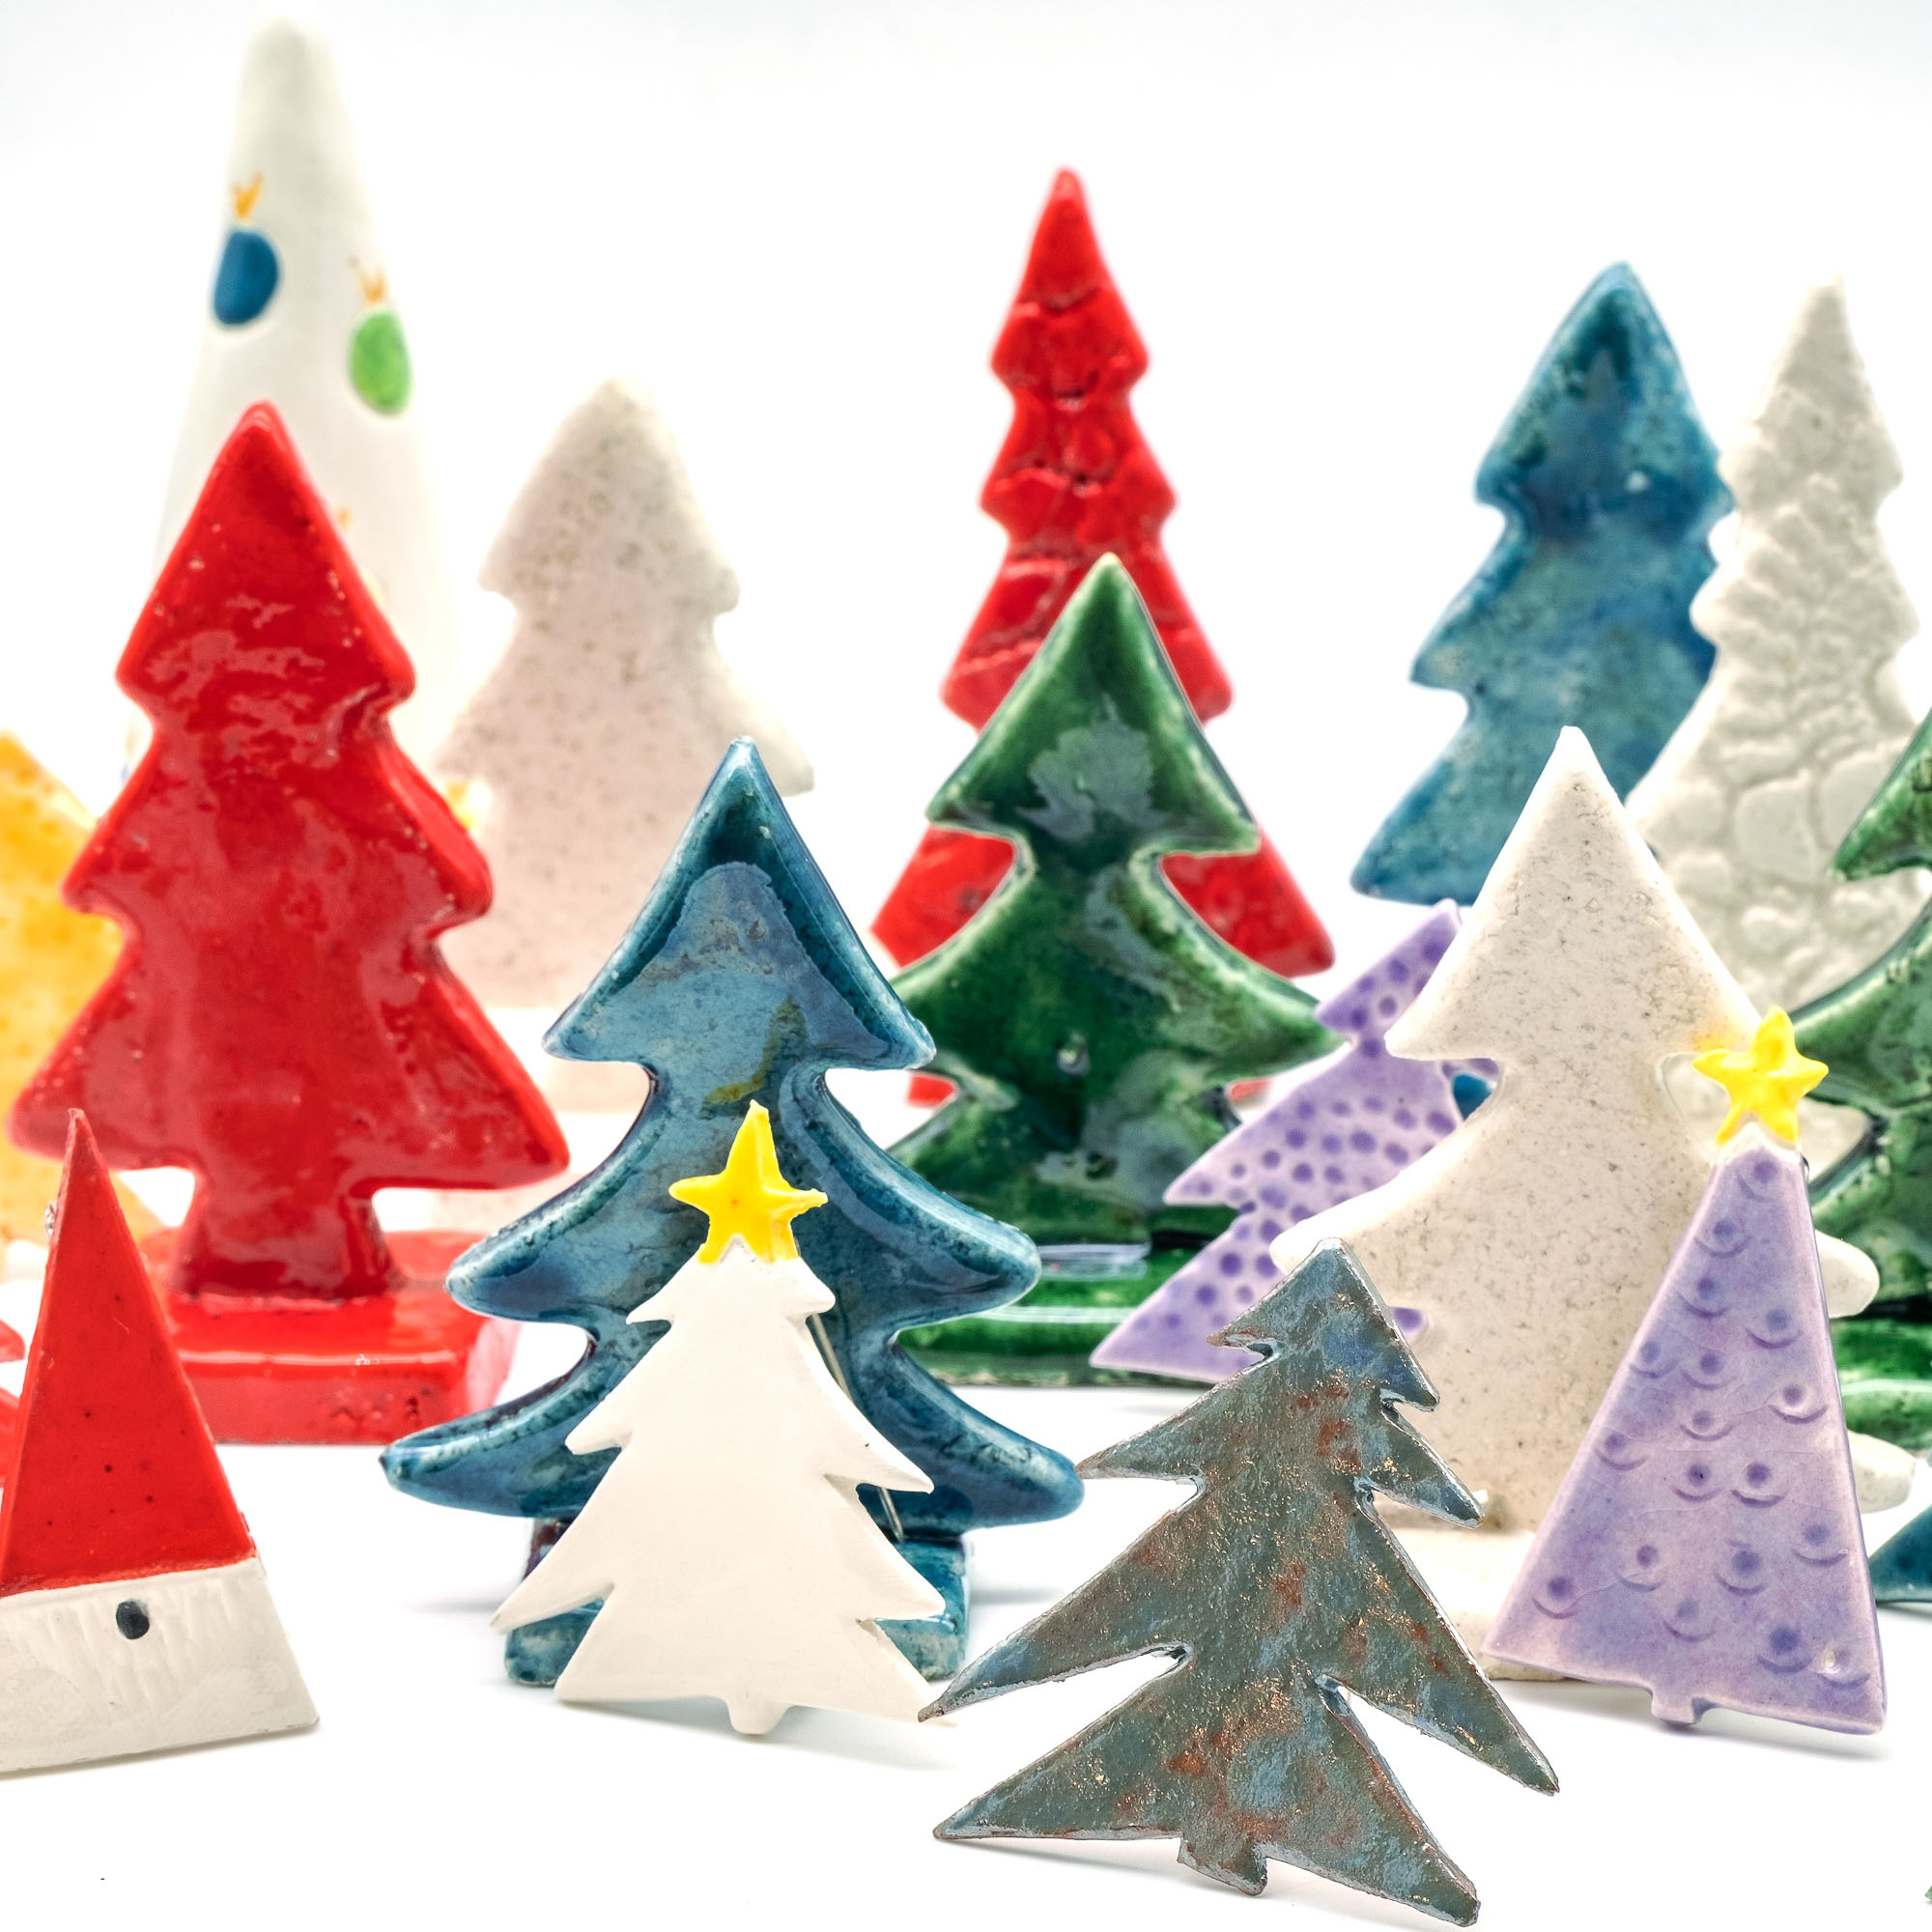 Alberi di Natale in Ceramica - Stefania Mairano Creazioni in Ceramica